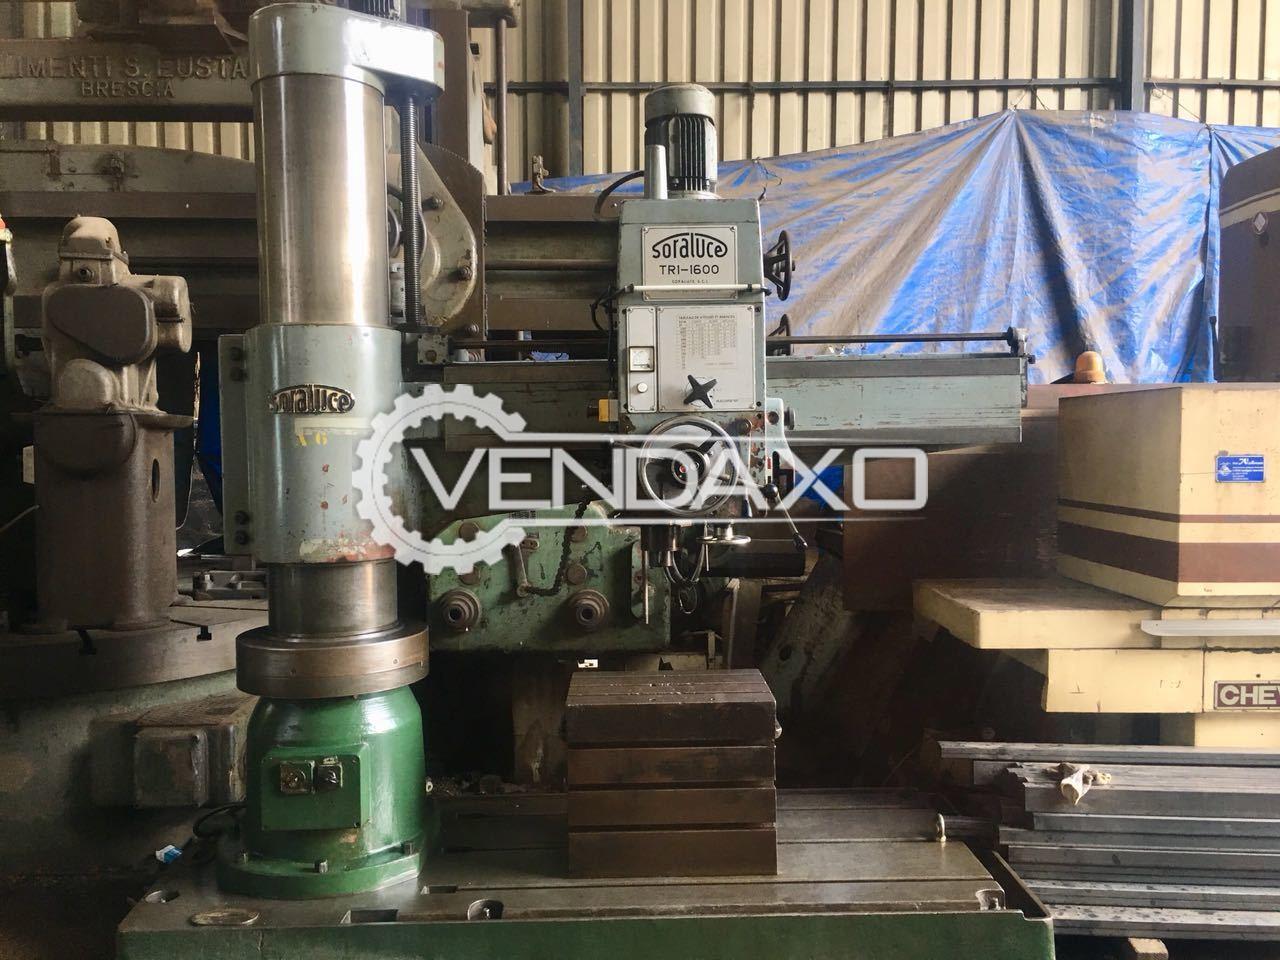 Soraluce TR1-1600 Radial Drill Machine